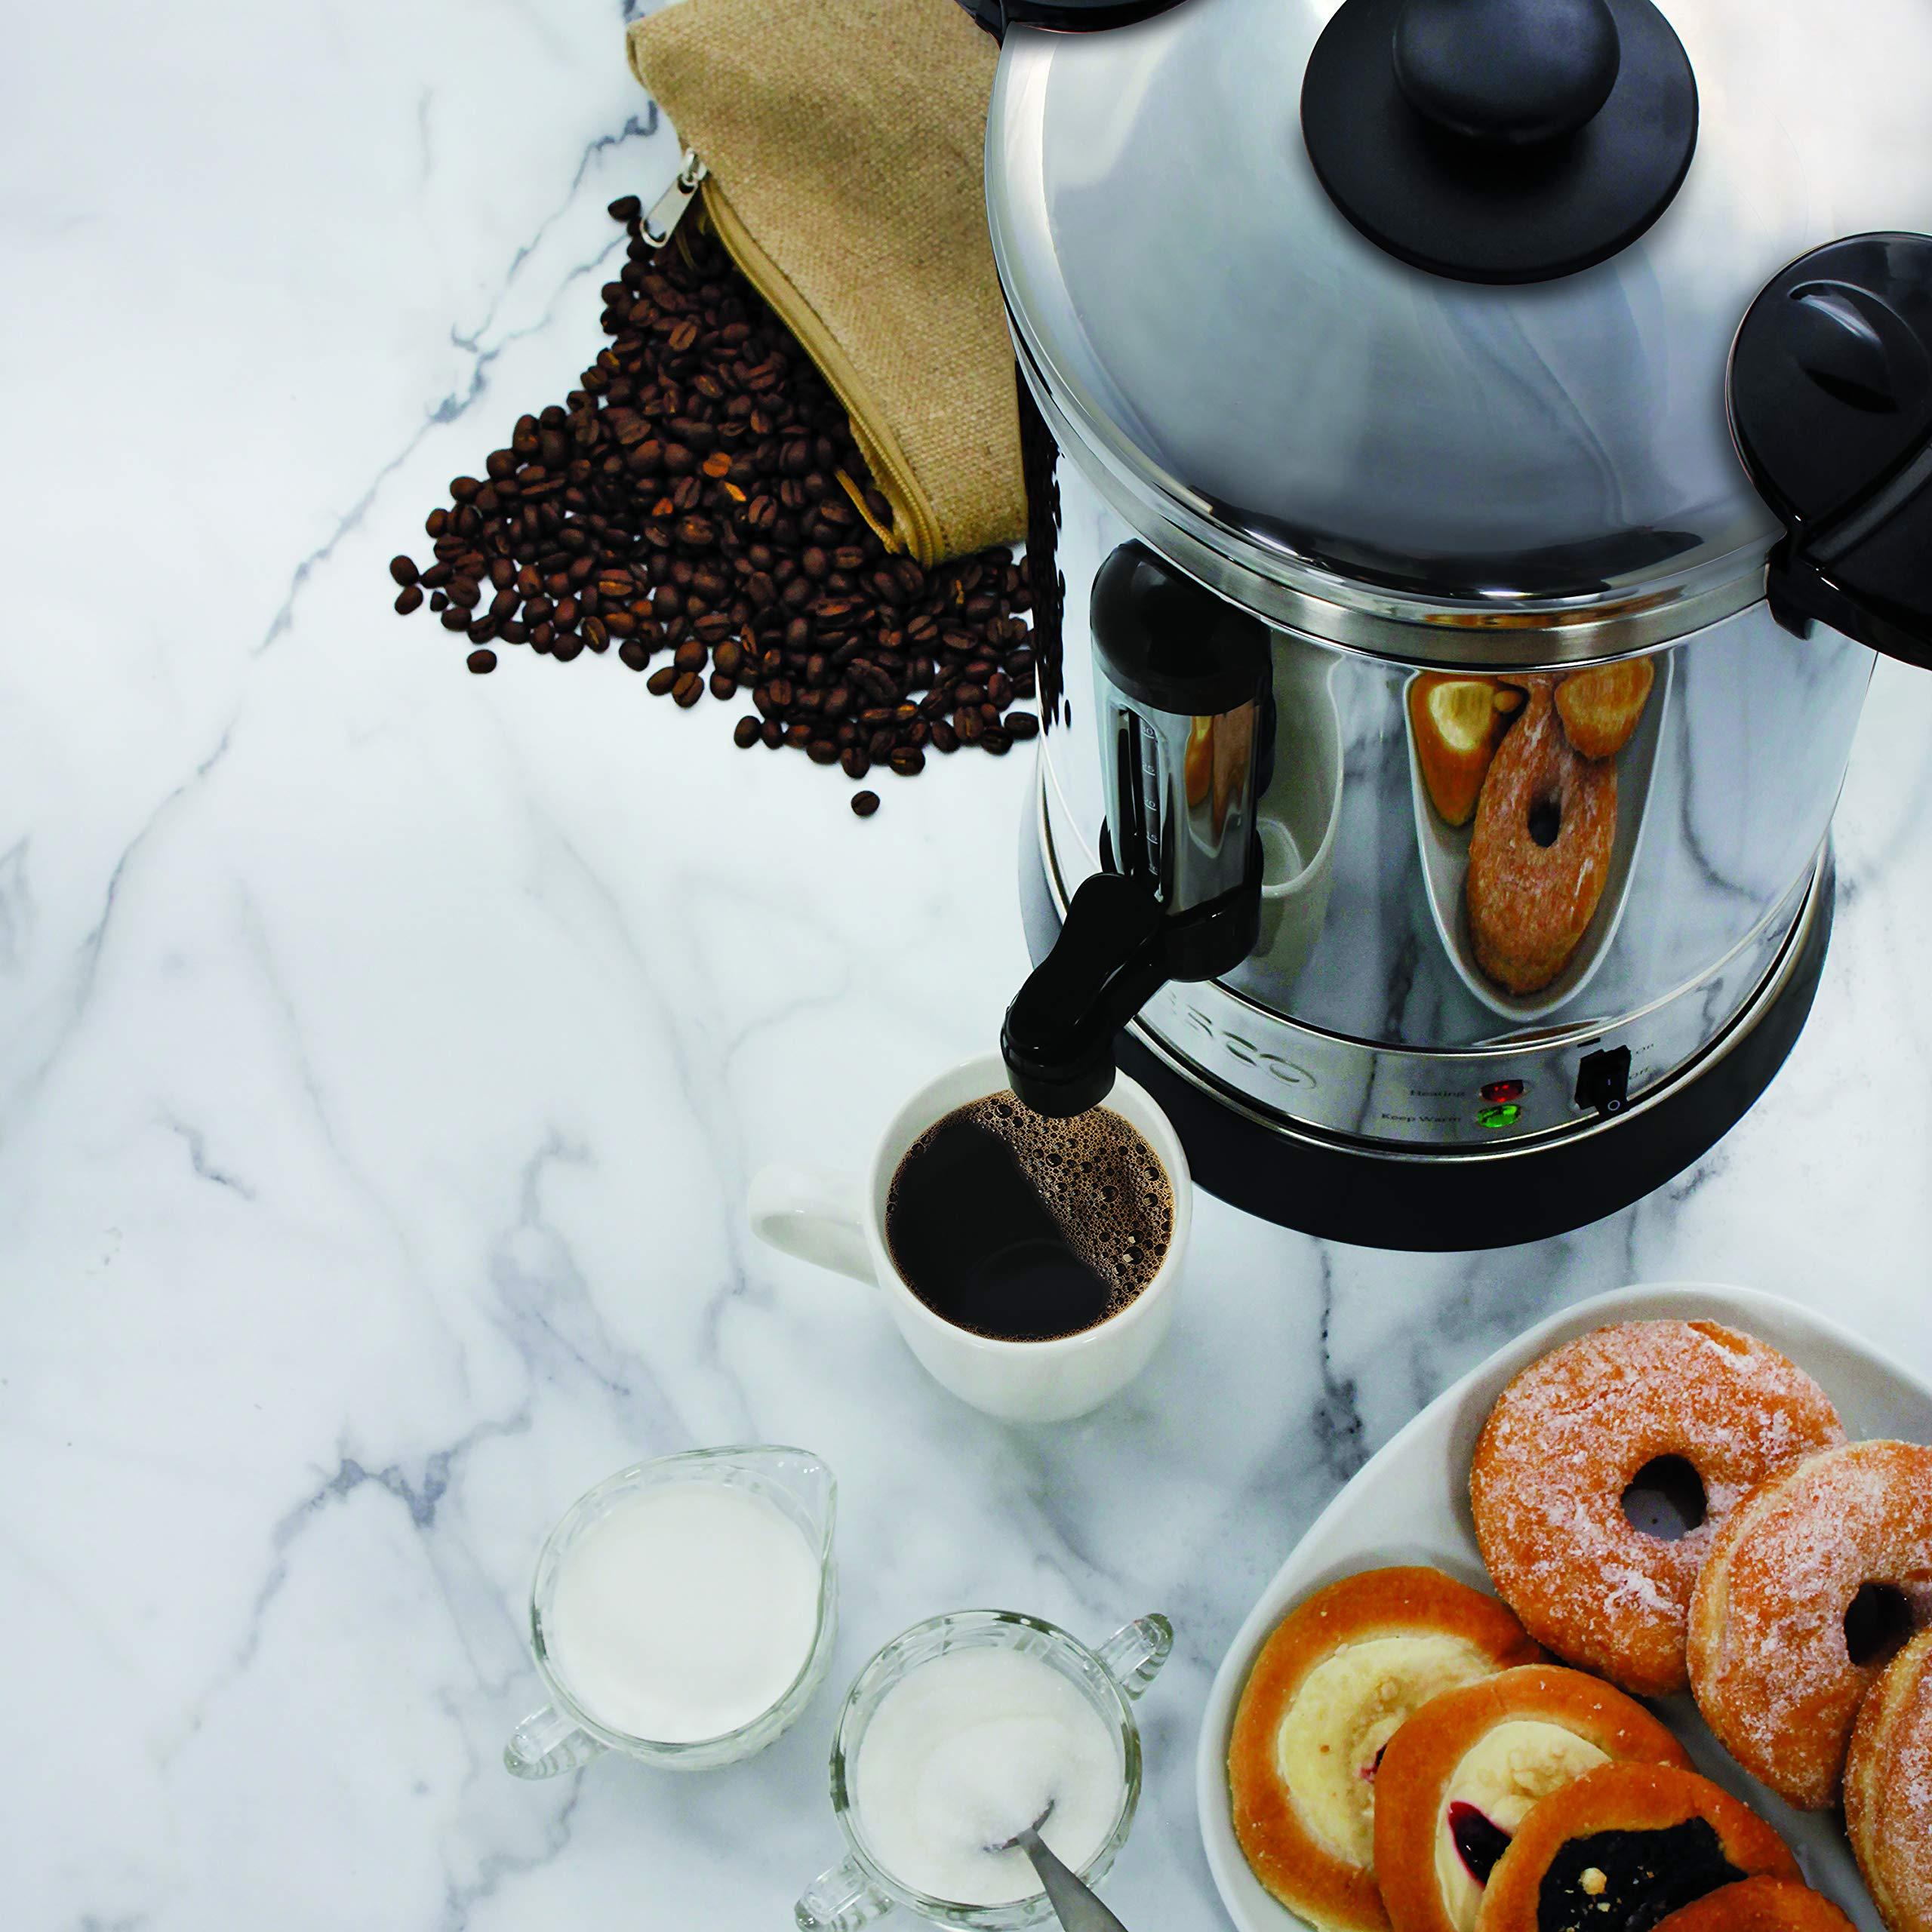 Nesco CU-30 Professional Coffee Urn Stainless Steel by Nesco (Image #5)